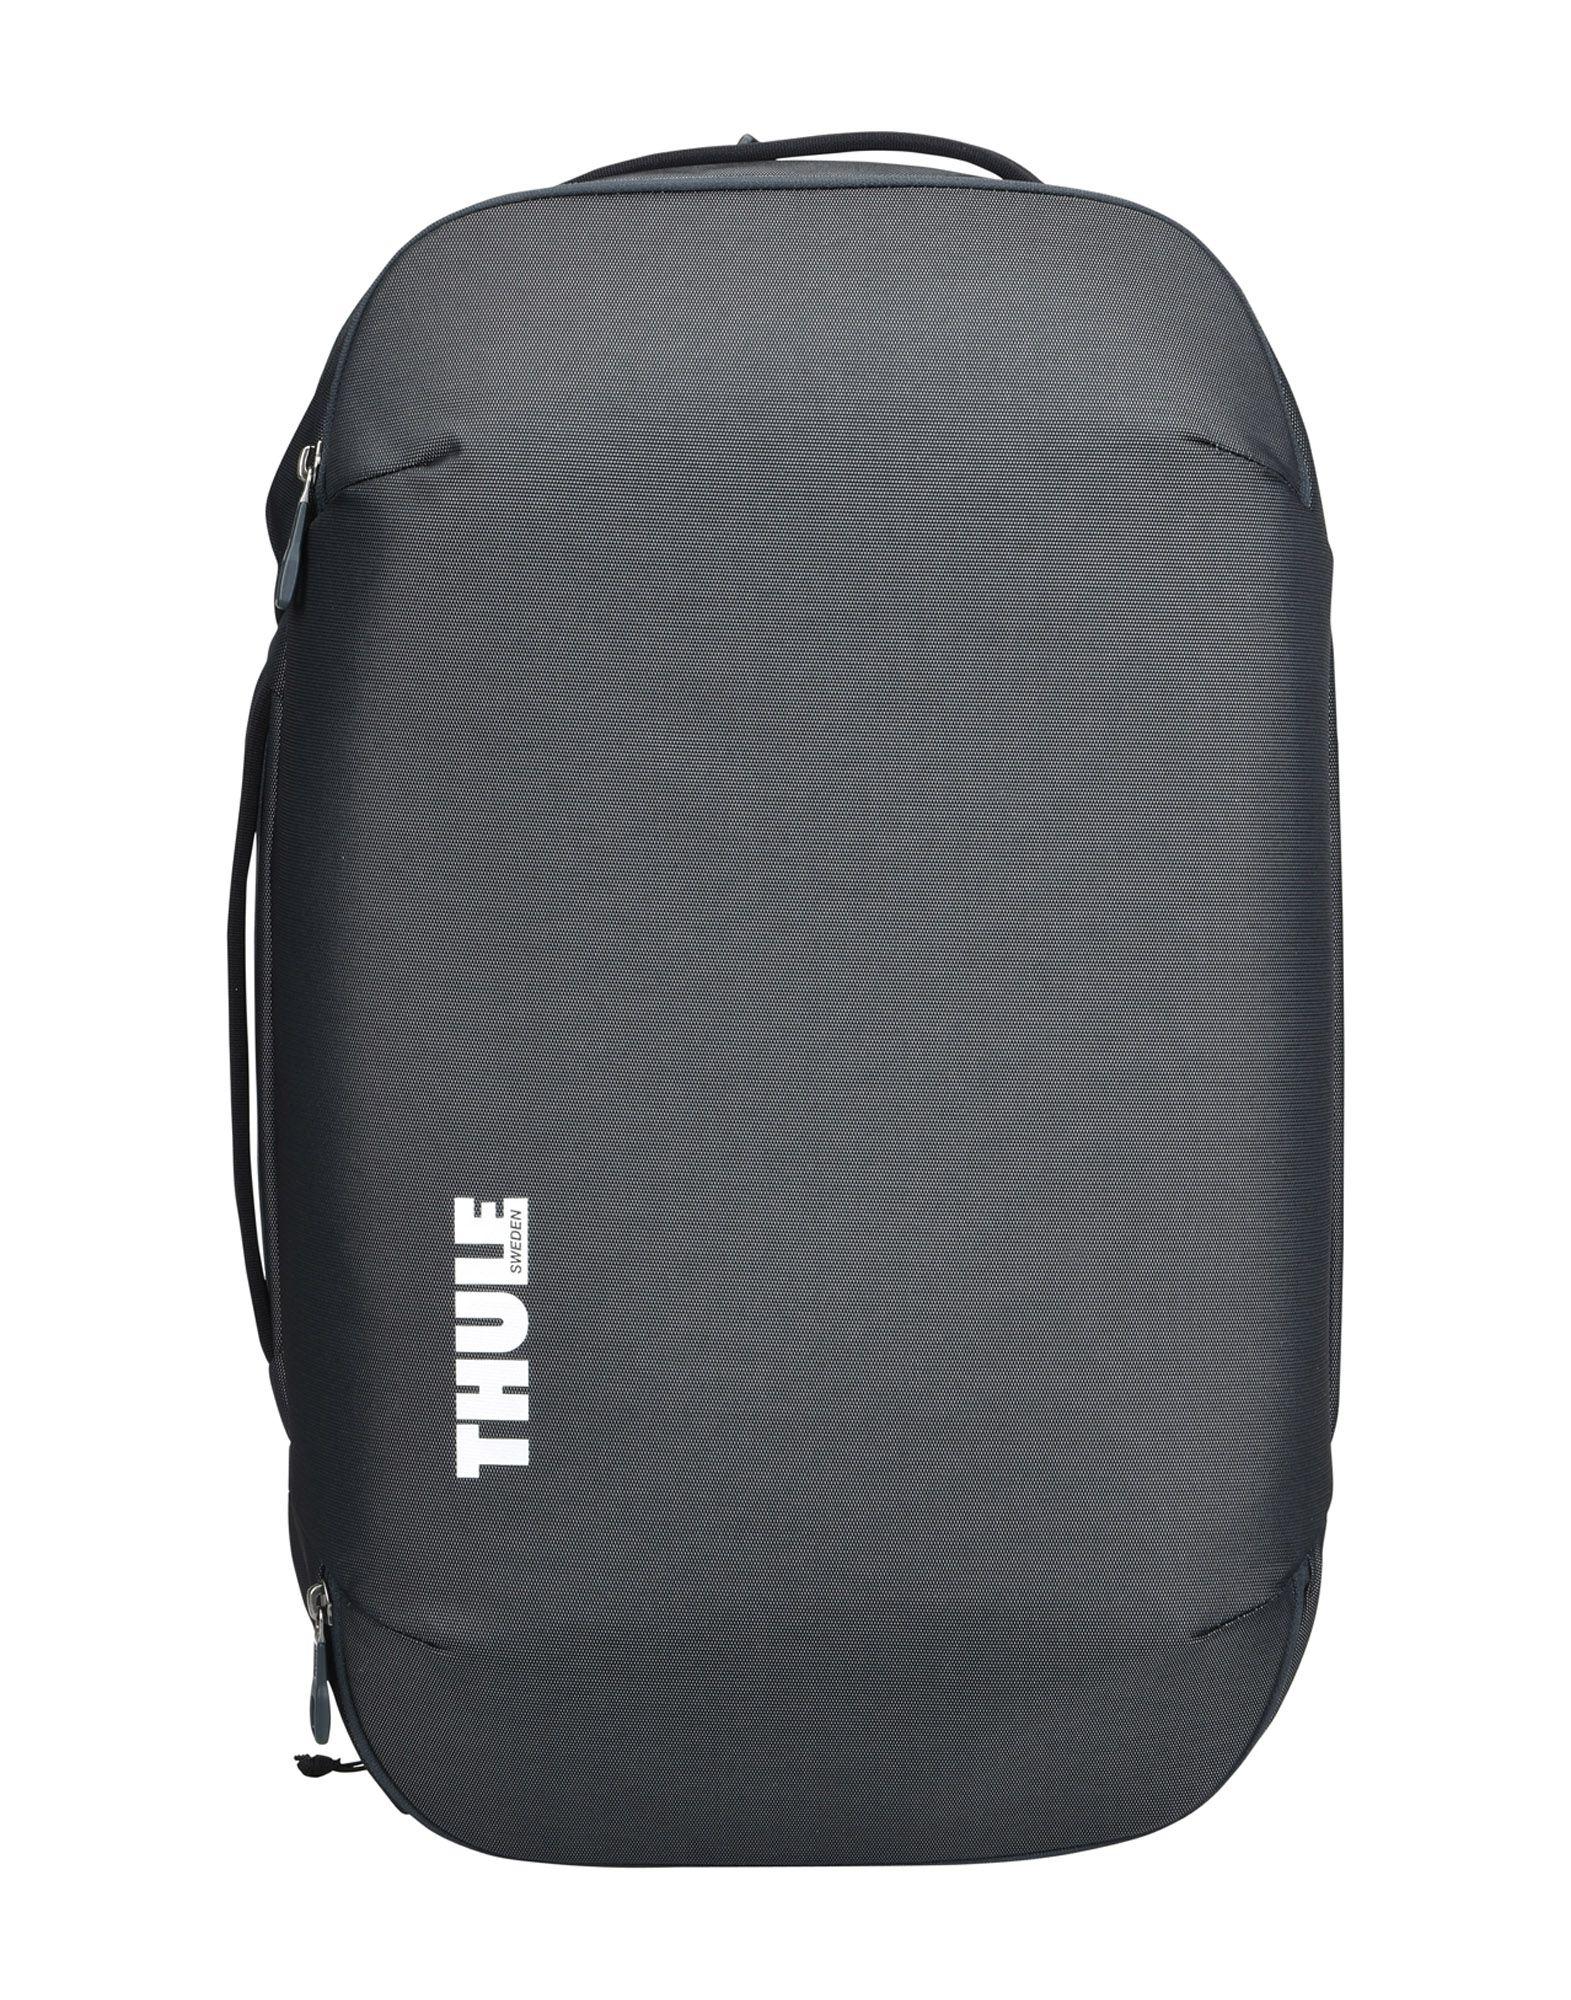 THULE® Чемодан чемодан thule subterra luggage 70cm 28 tsr 375 т синий